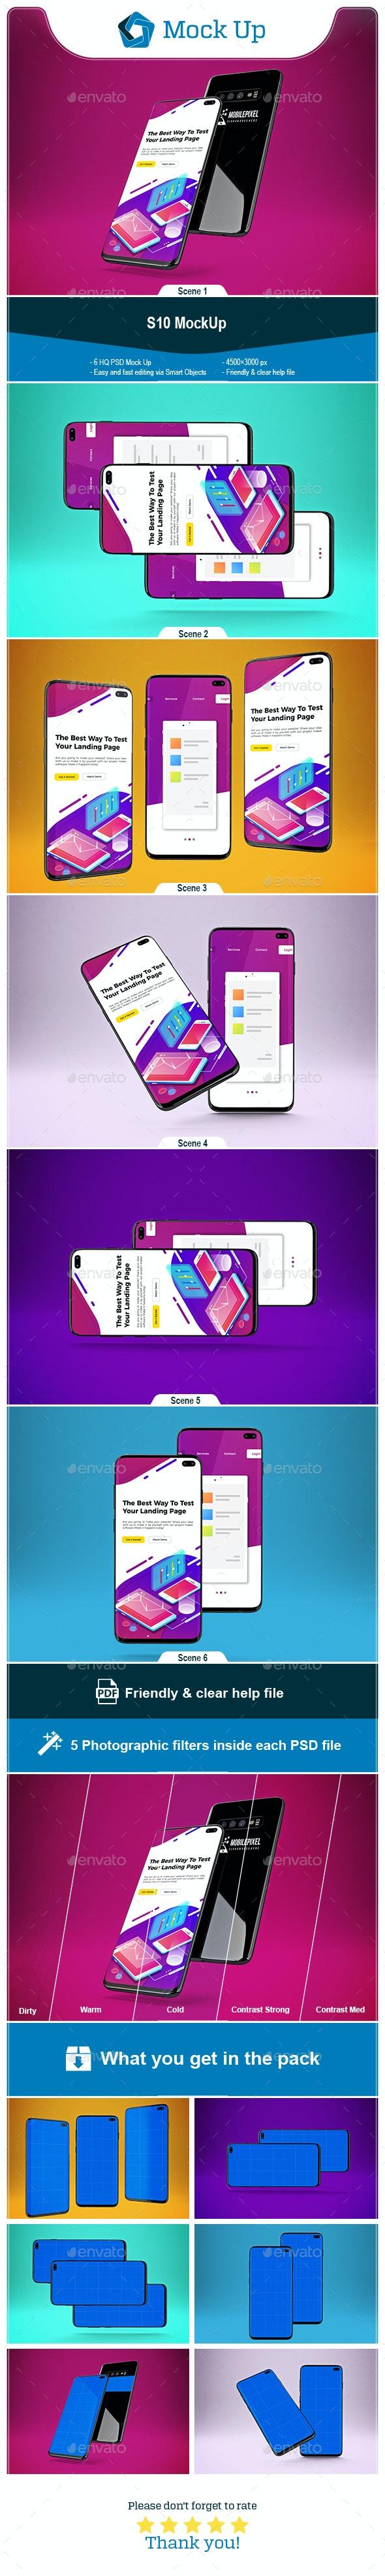 S10 MockUp - Mobile Displays